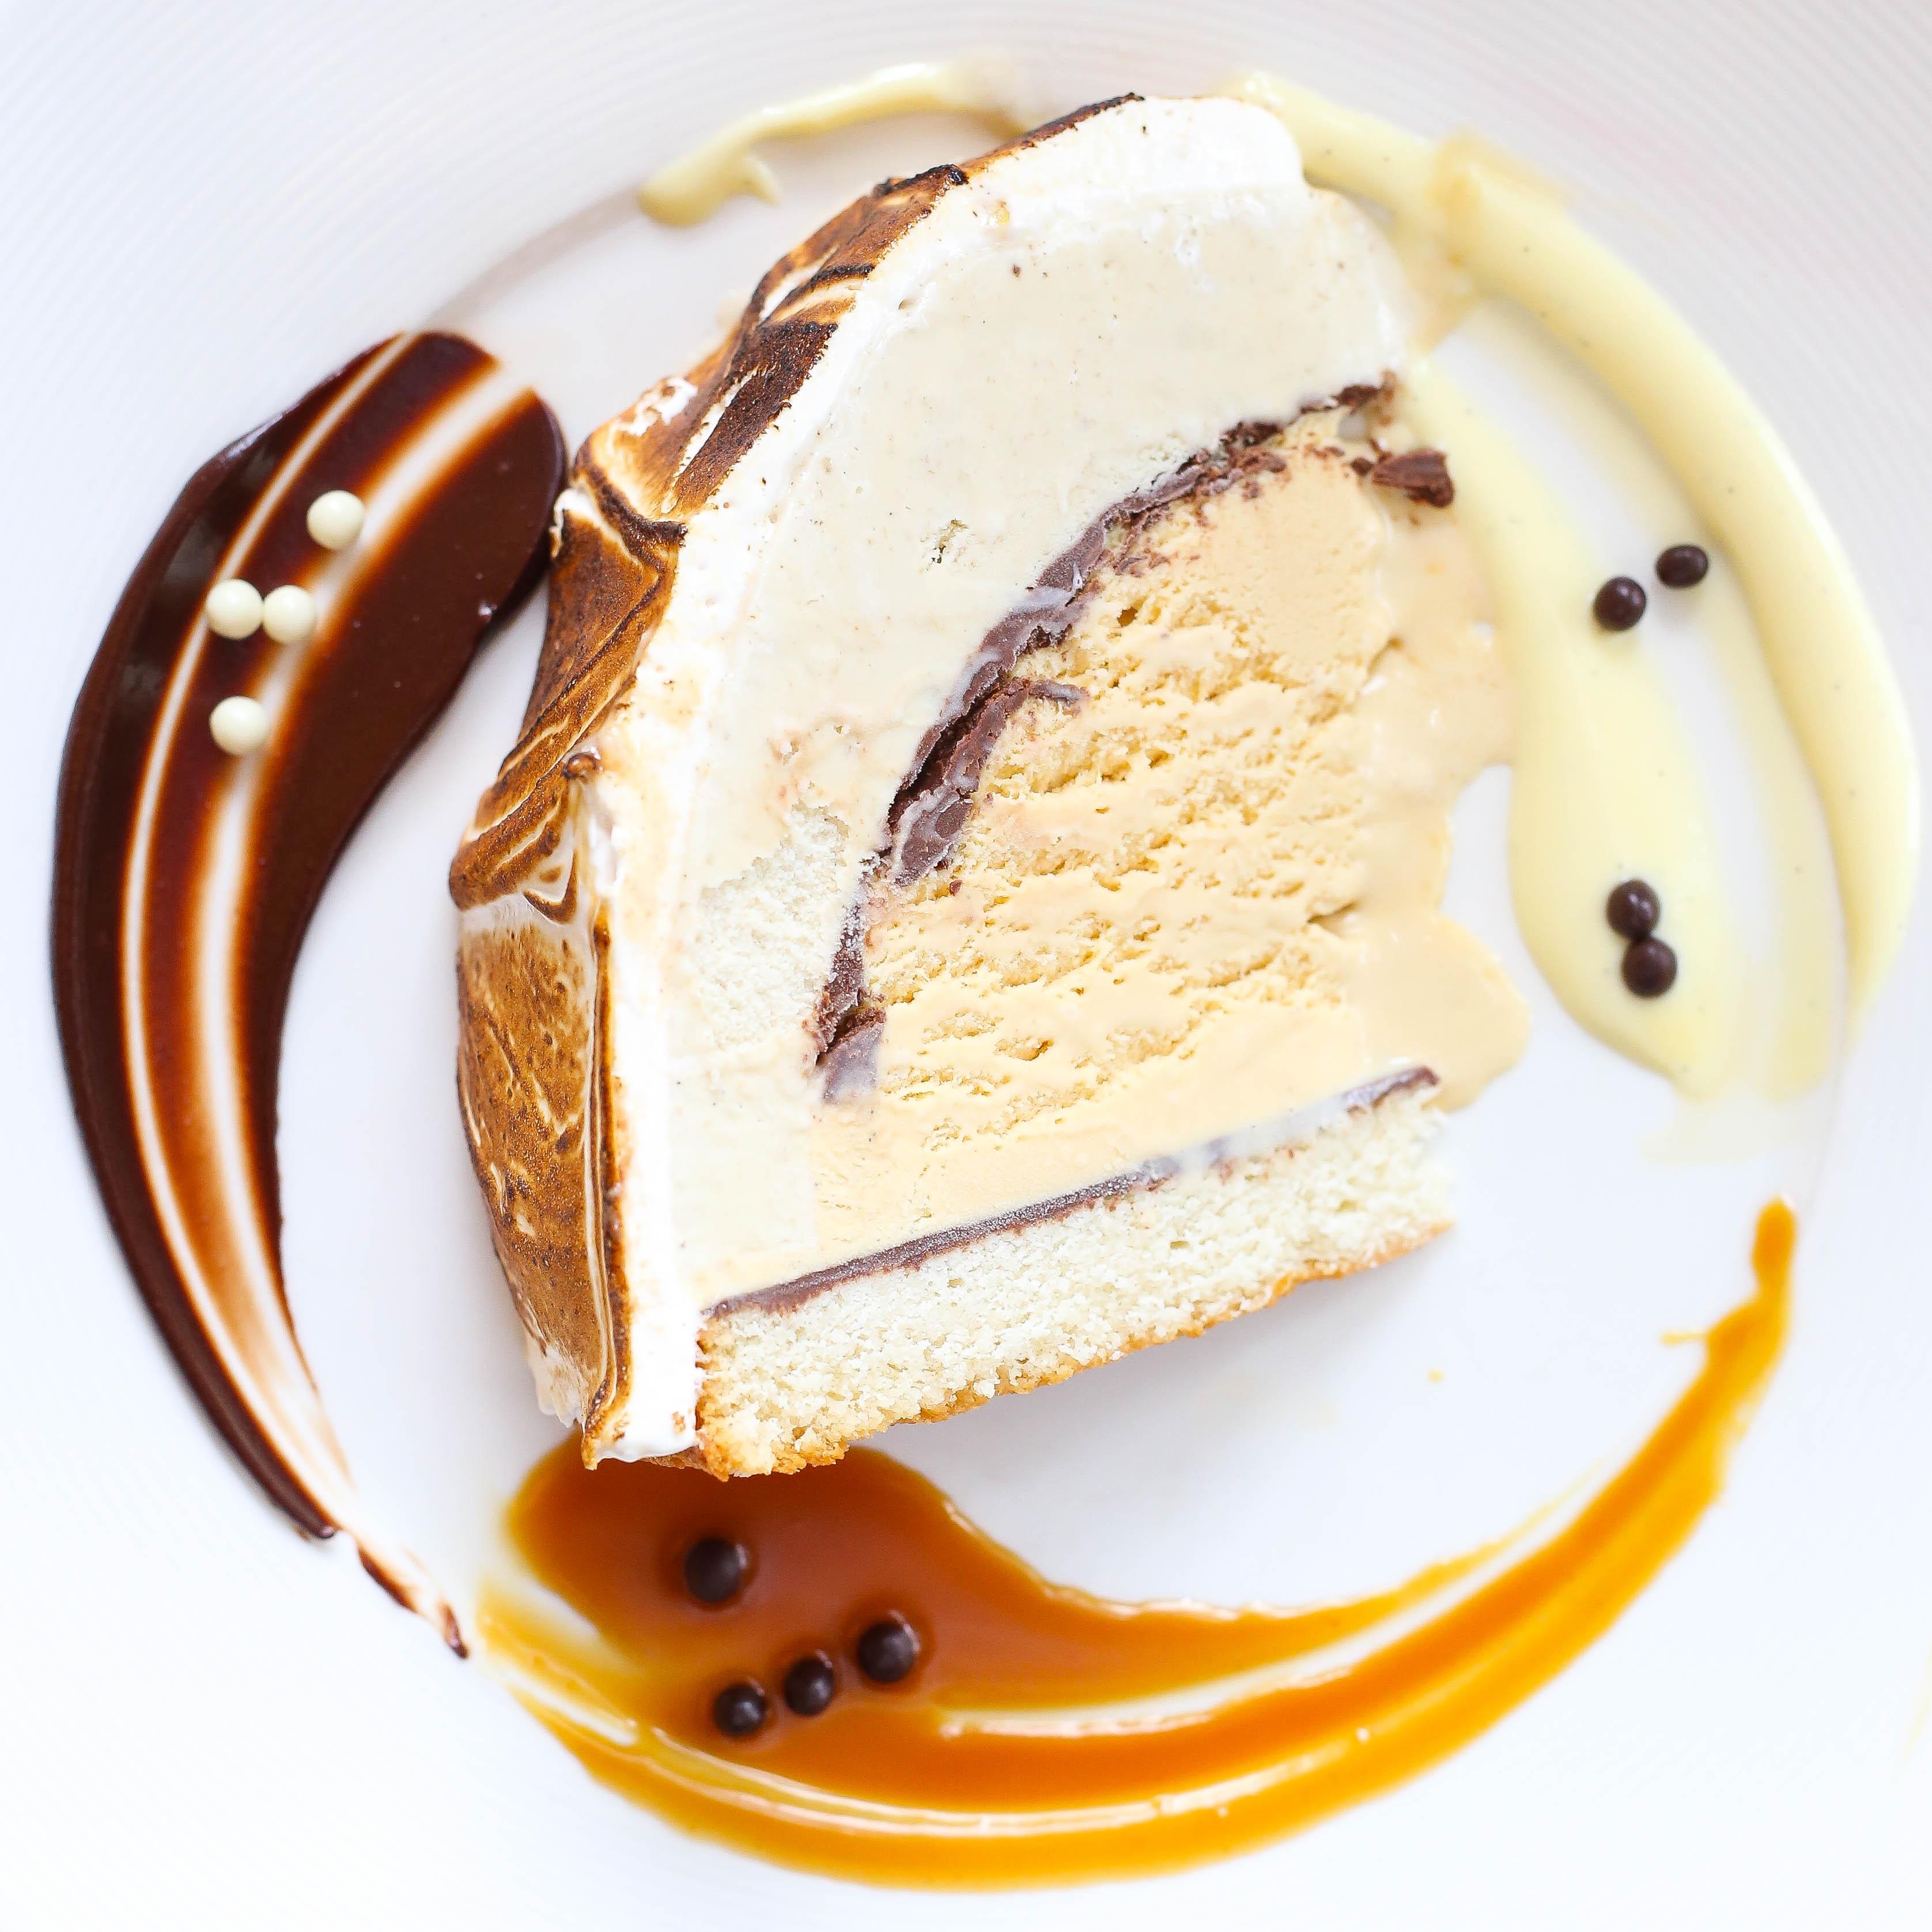 portlant-dessert-papa-haydn-baked-alaska